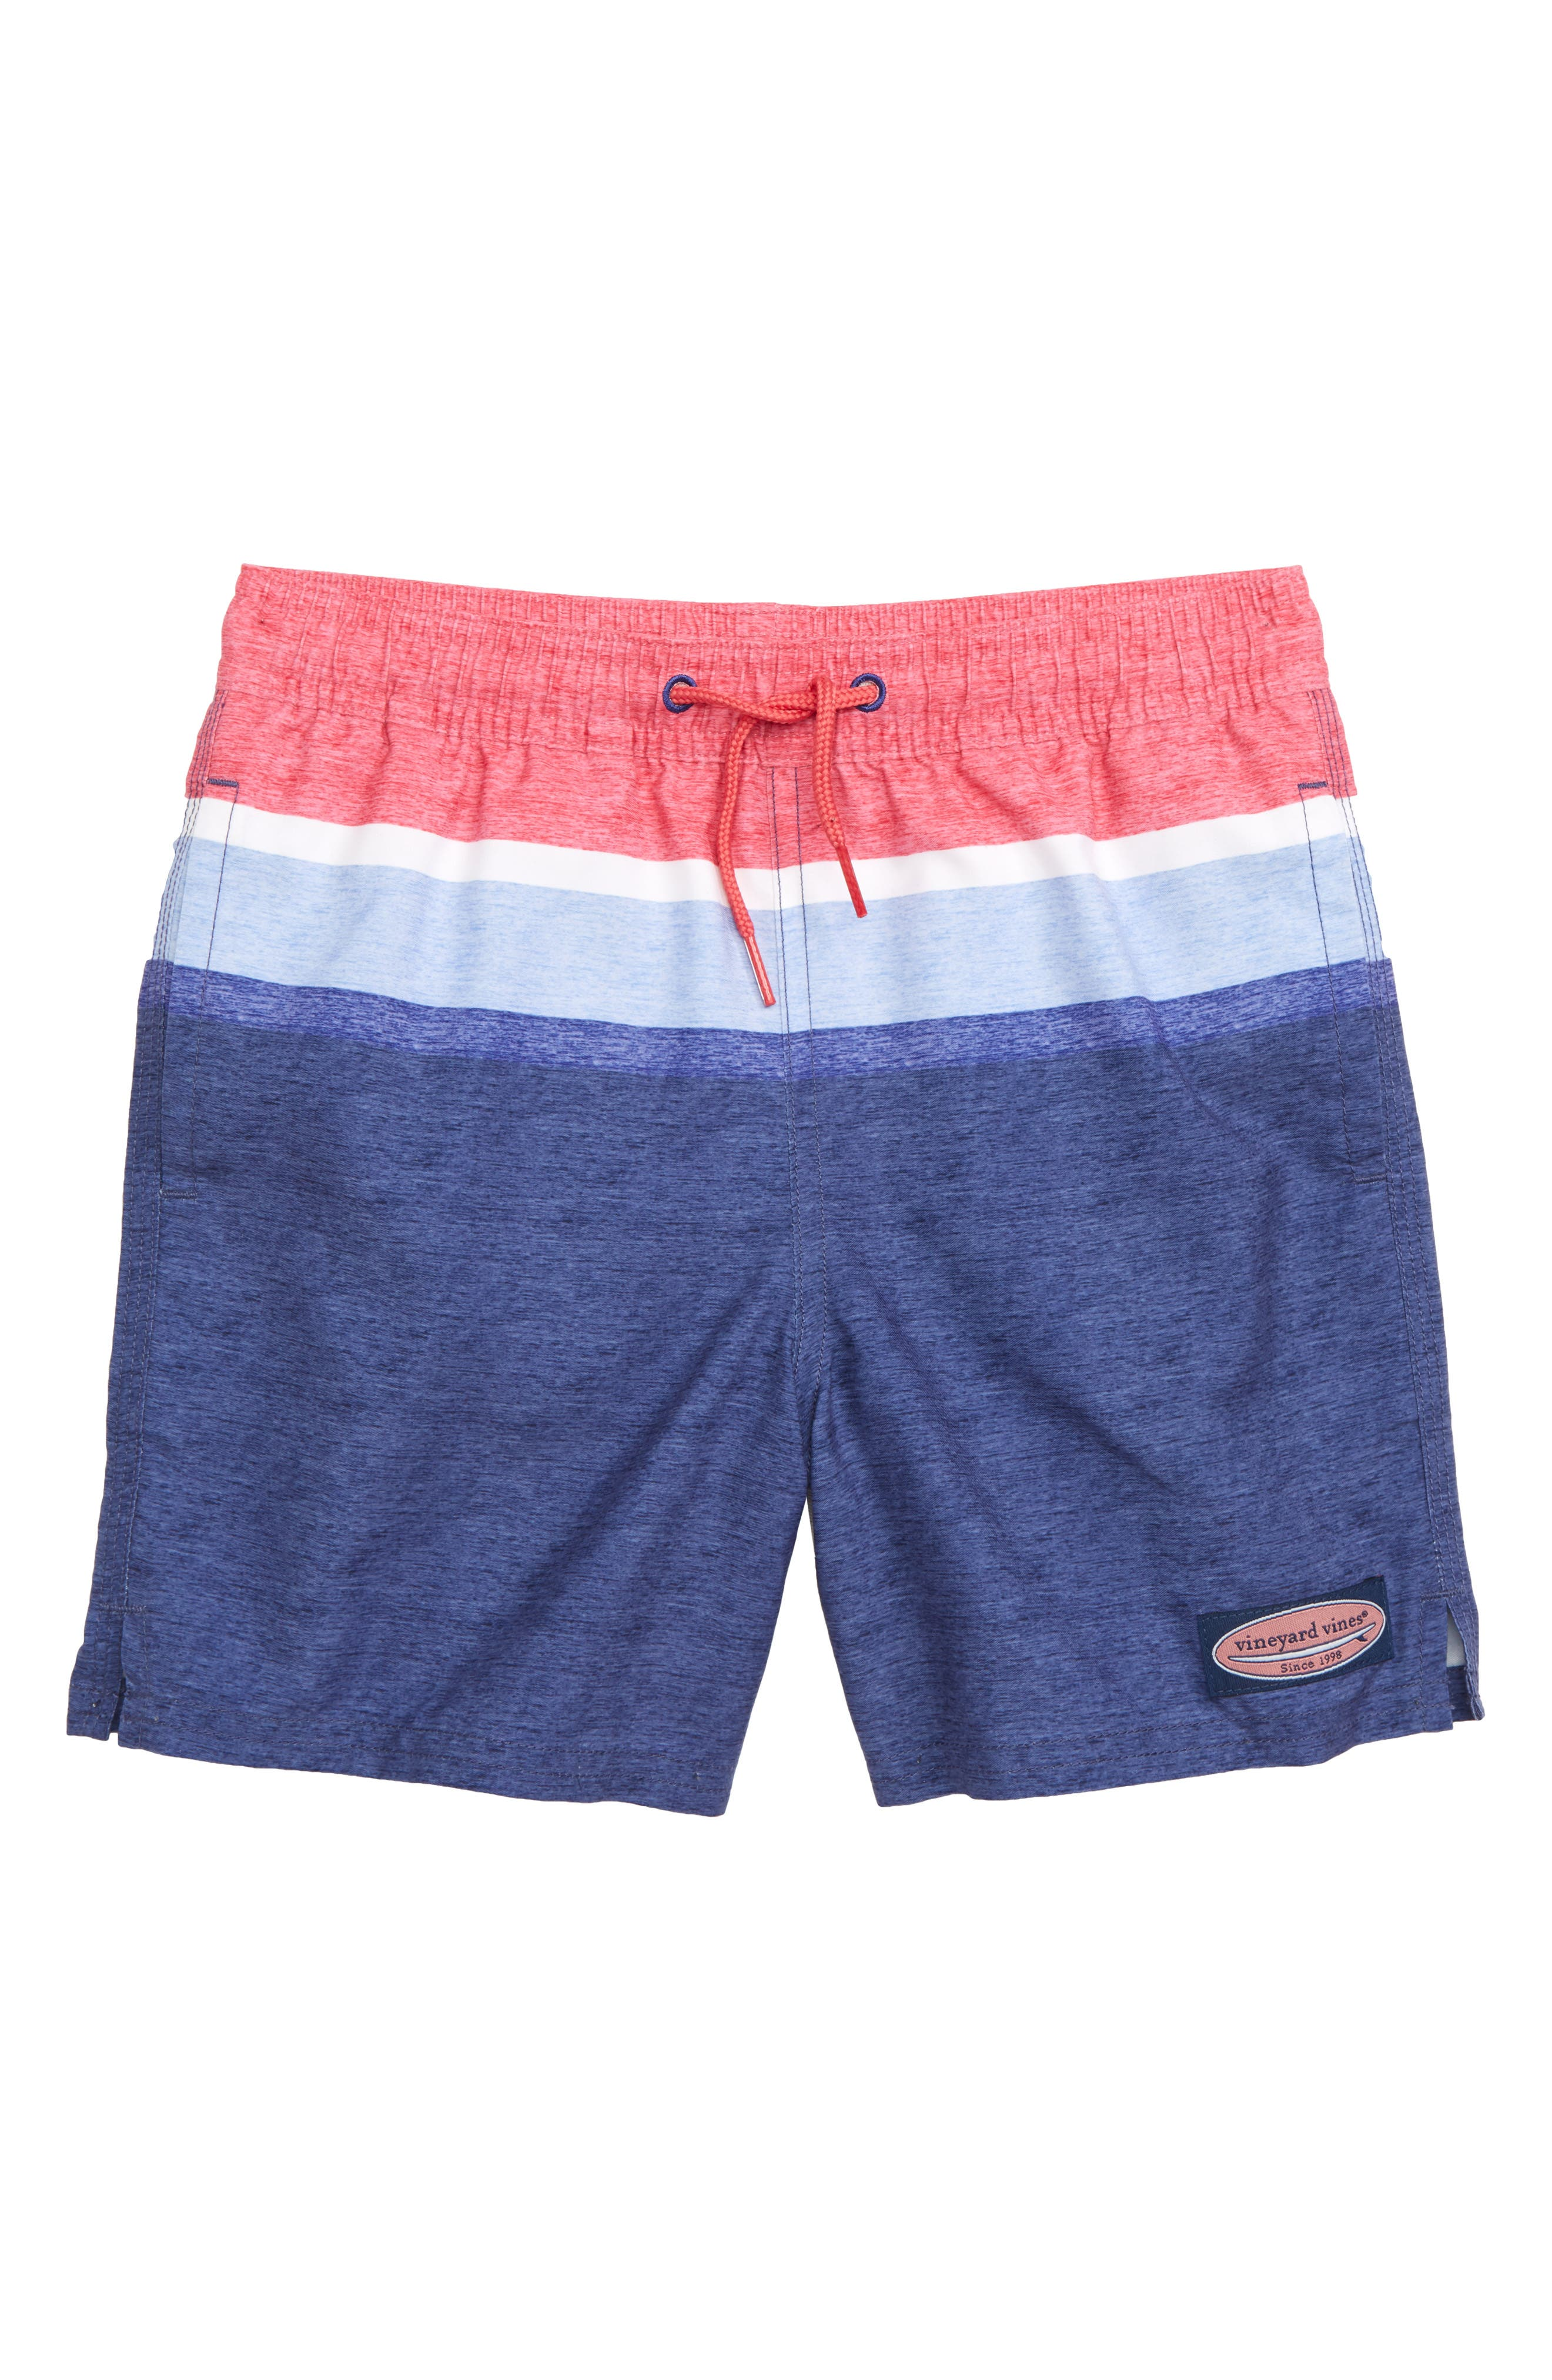 f713f7fdfa Vineyard Vines - Boys Swimwear and Beachwear